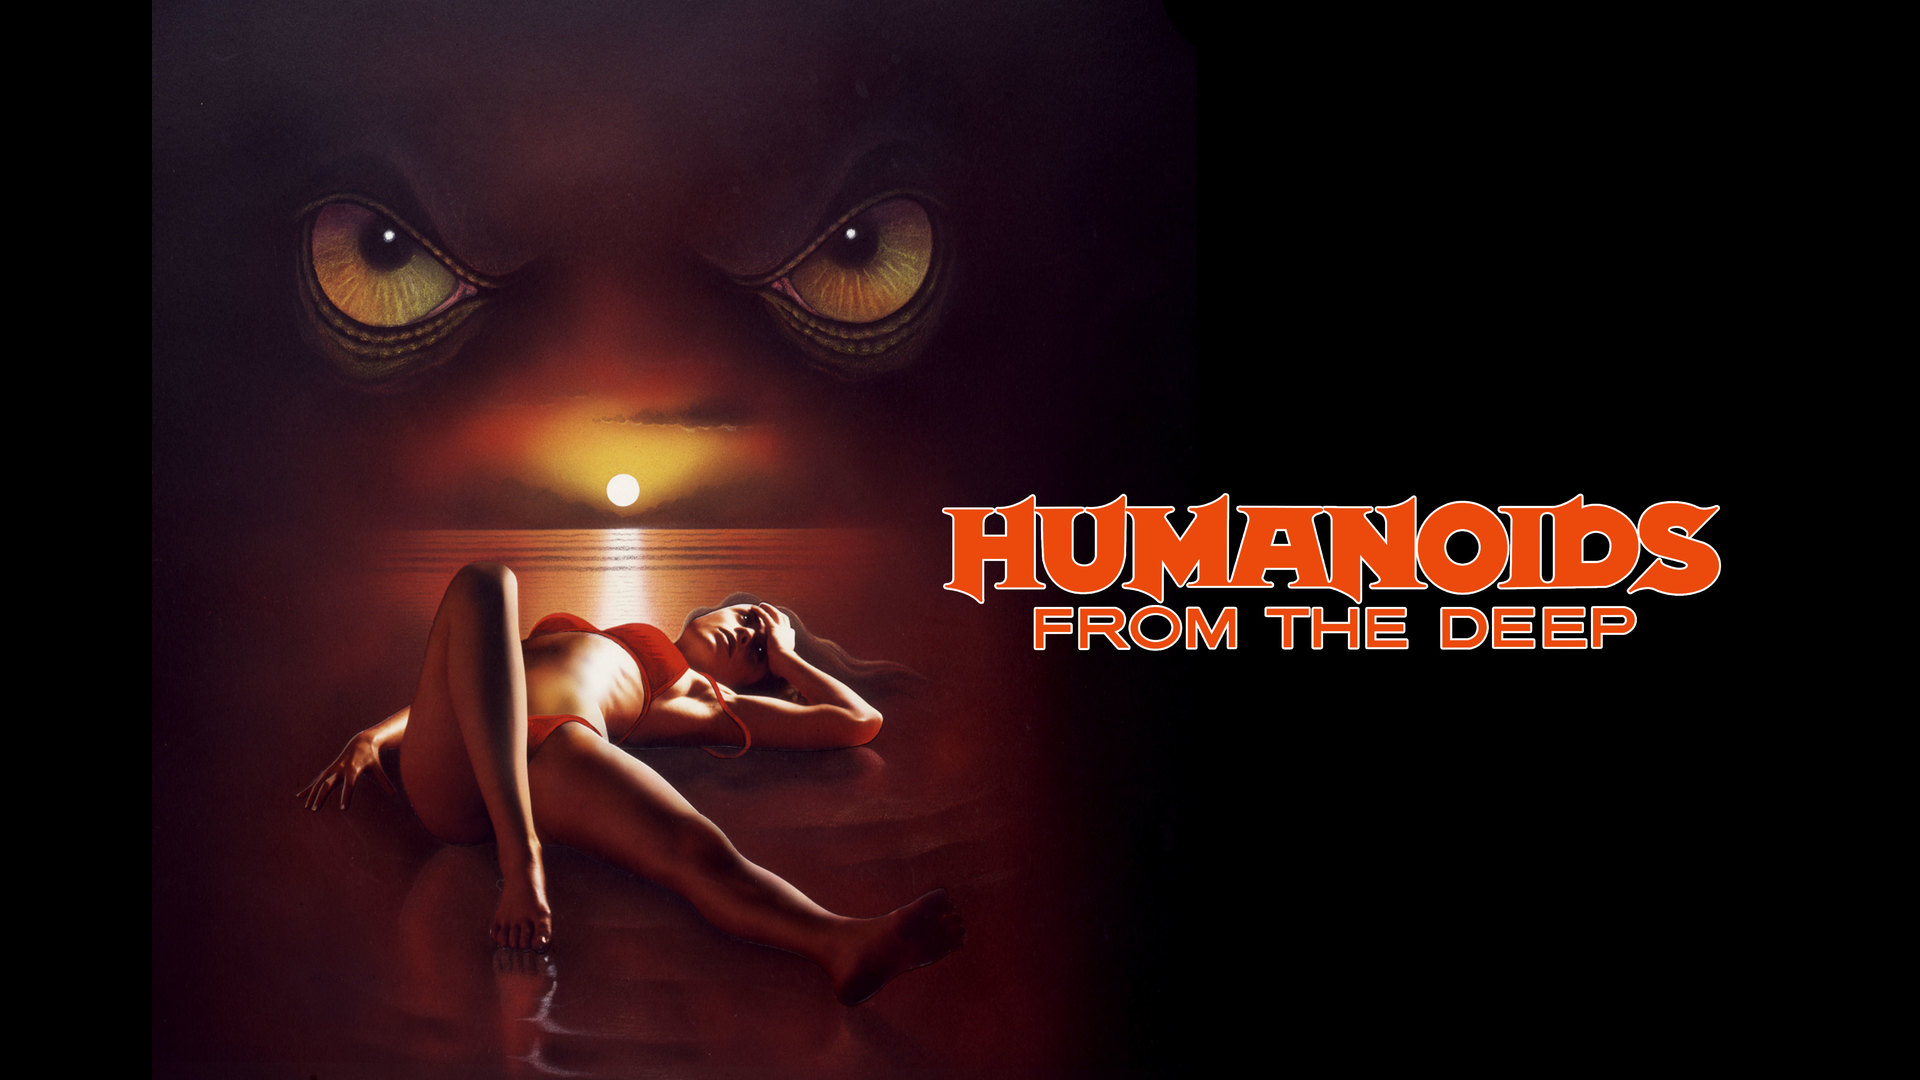 HumanoidsFromTheDeep